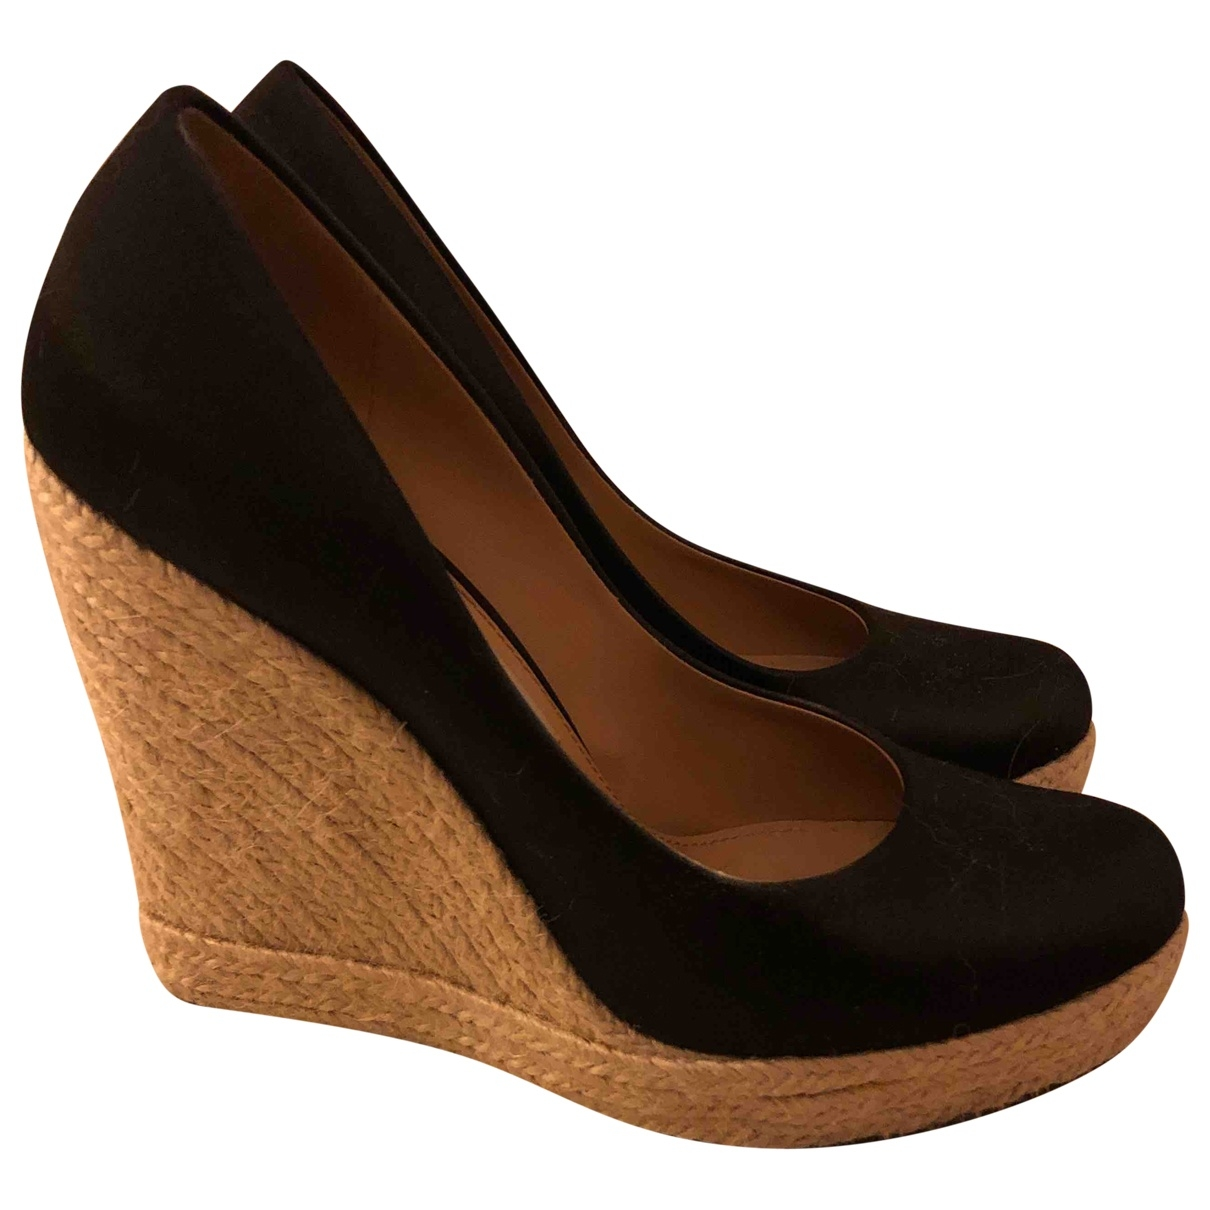 Salvatore Ferragamo \N Black Cloth Heels for Women 37 EU